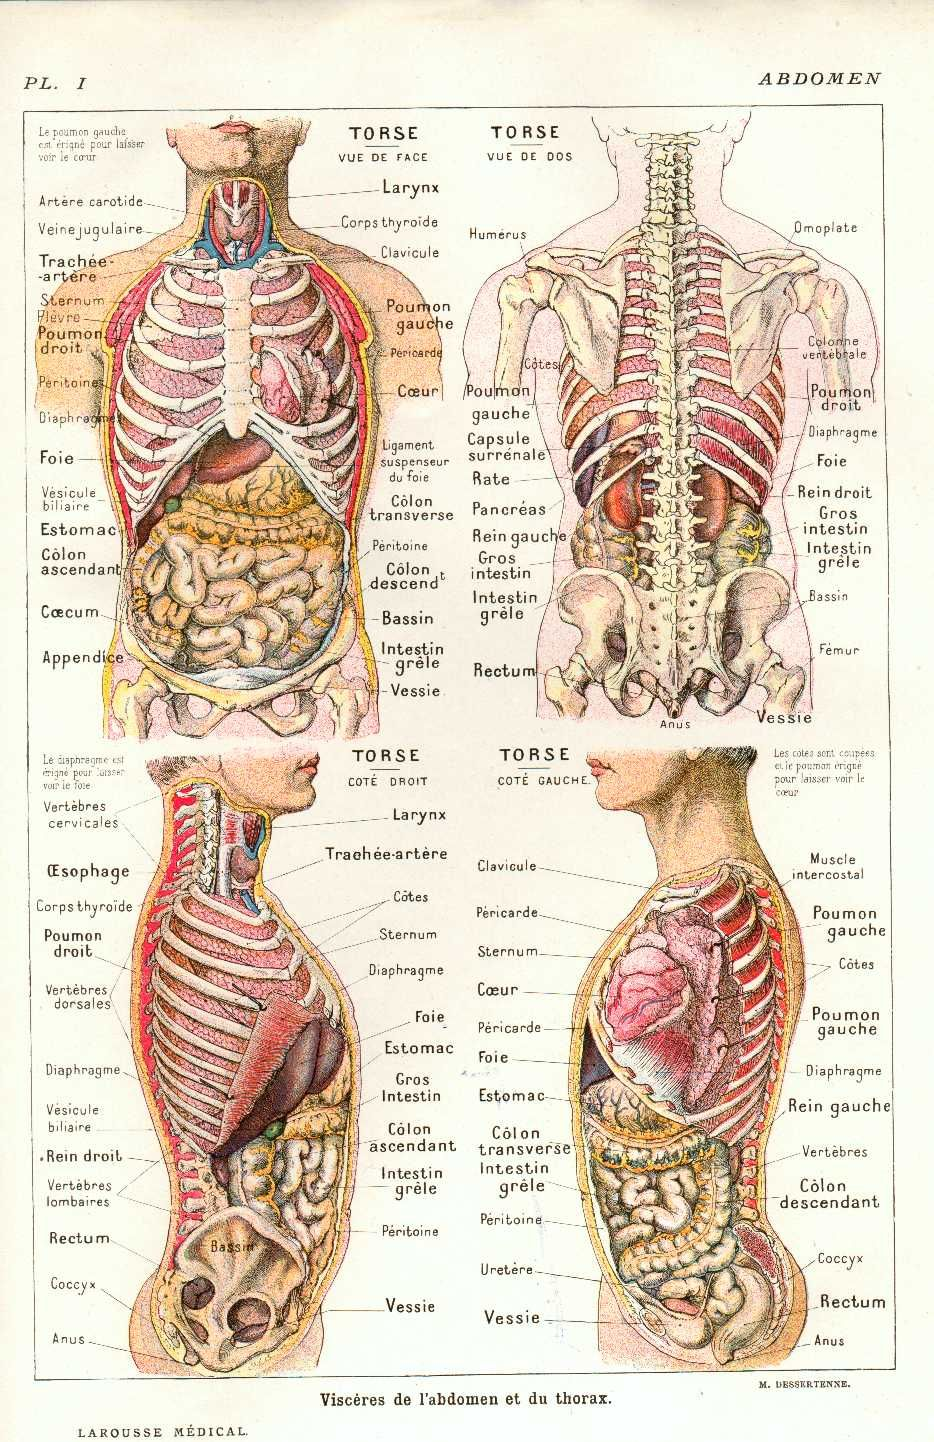 Anatomie thorax - abdomen | Nursing and A & P | Pinterest | Human ...